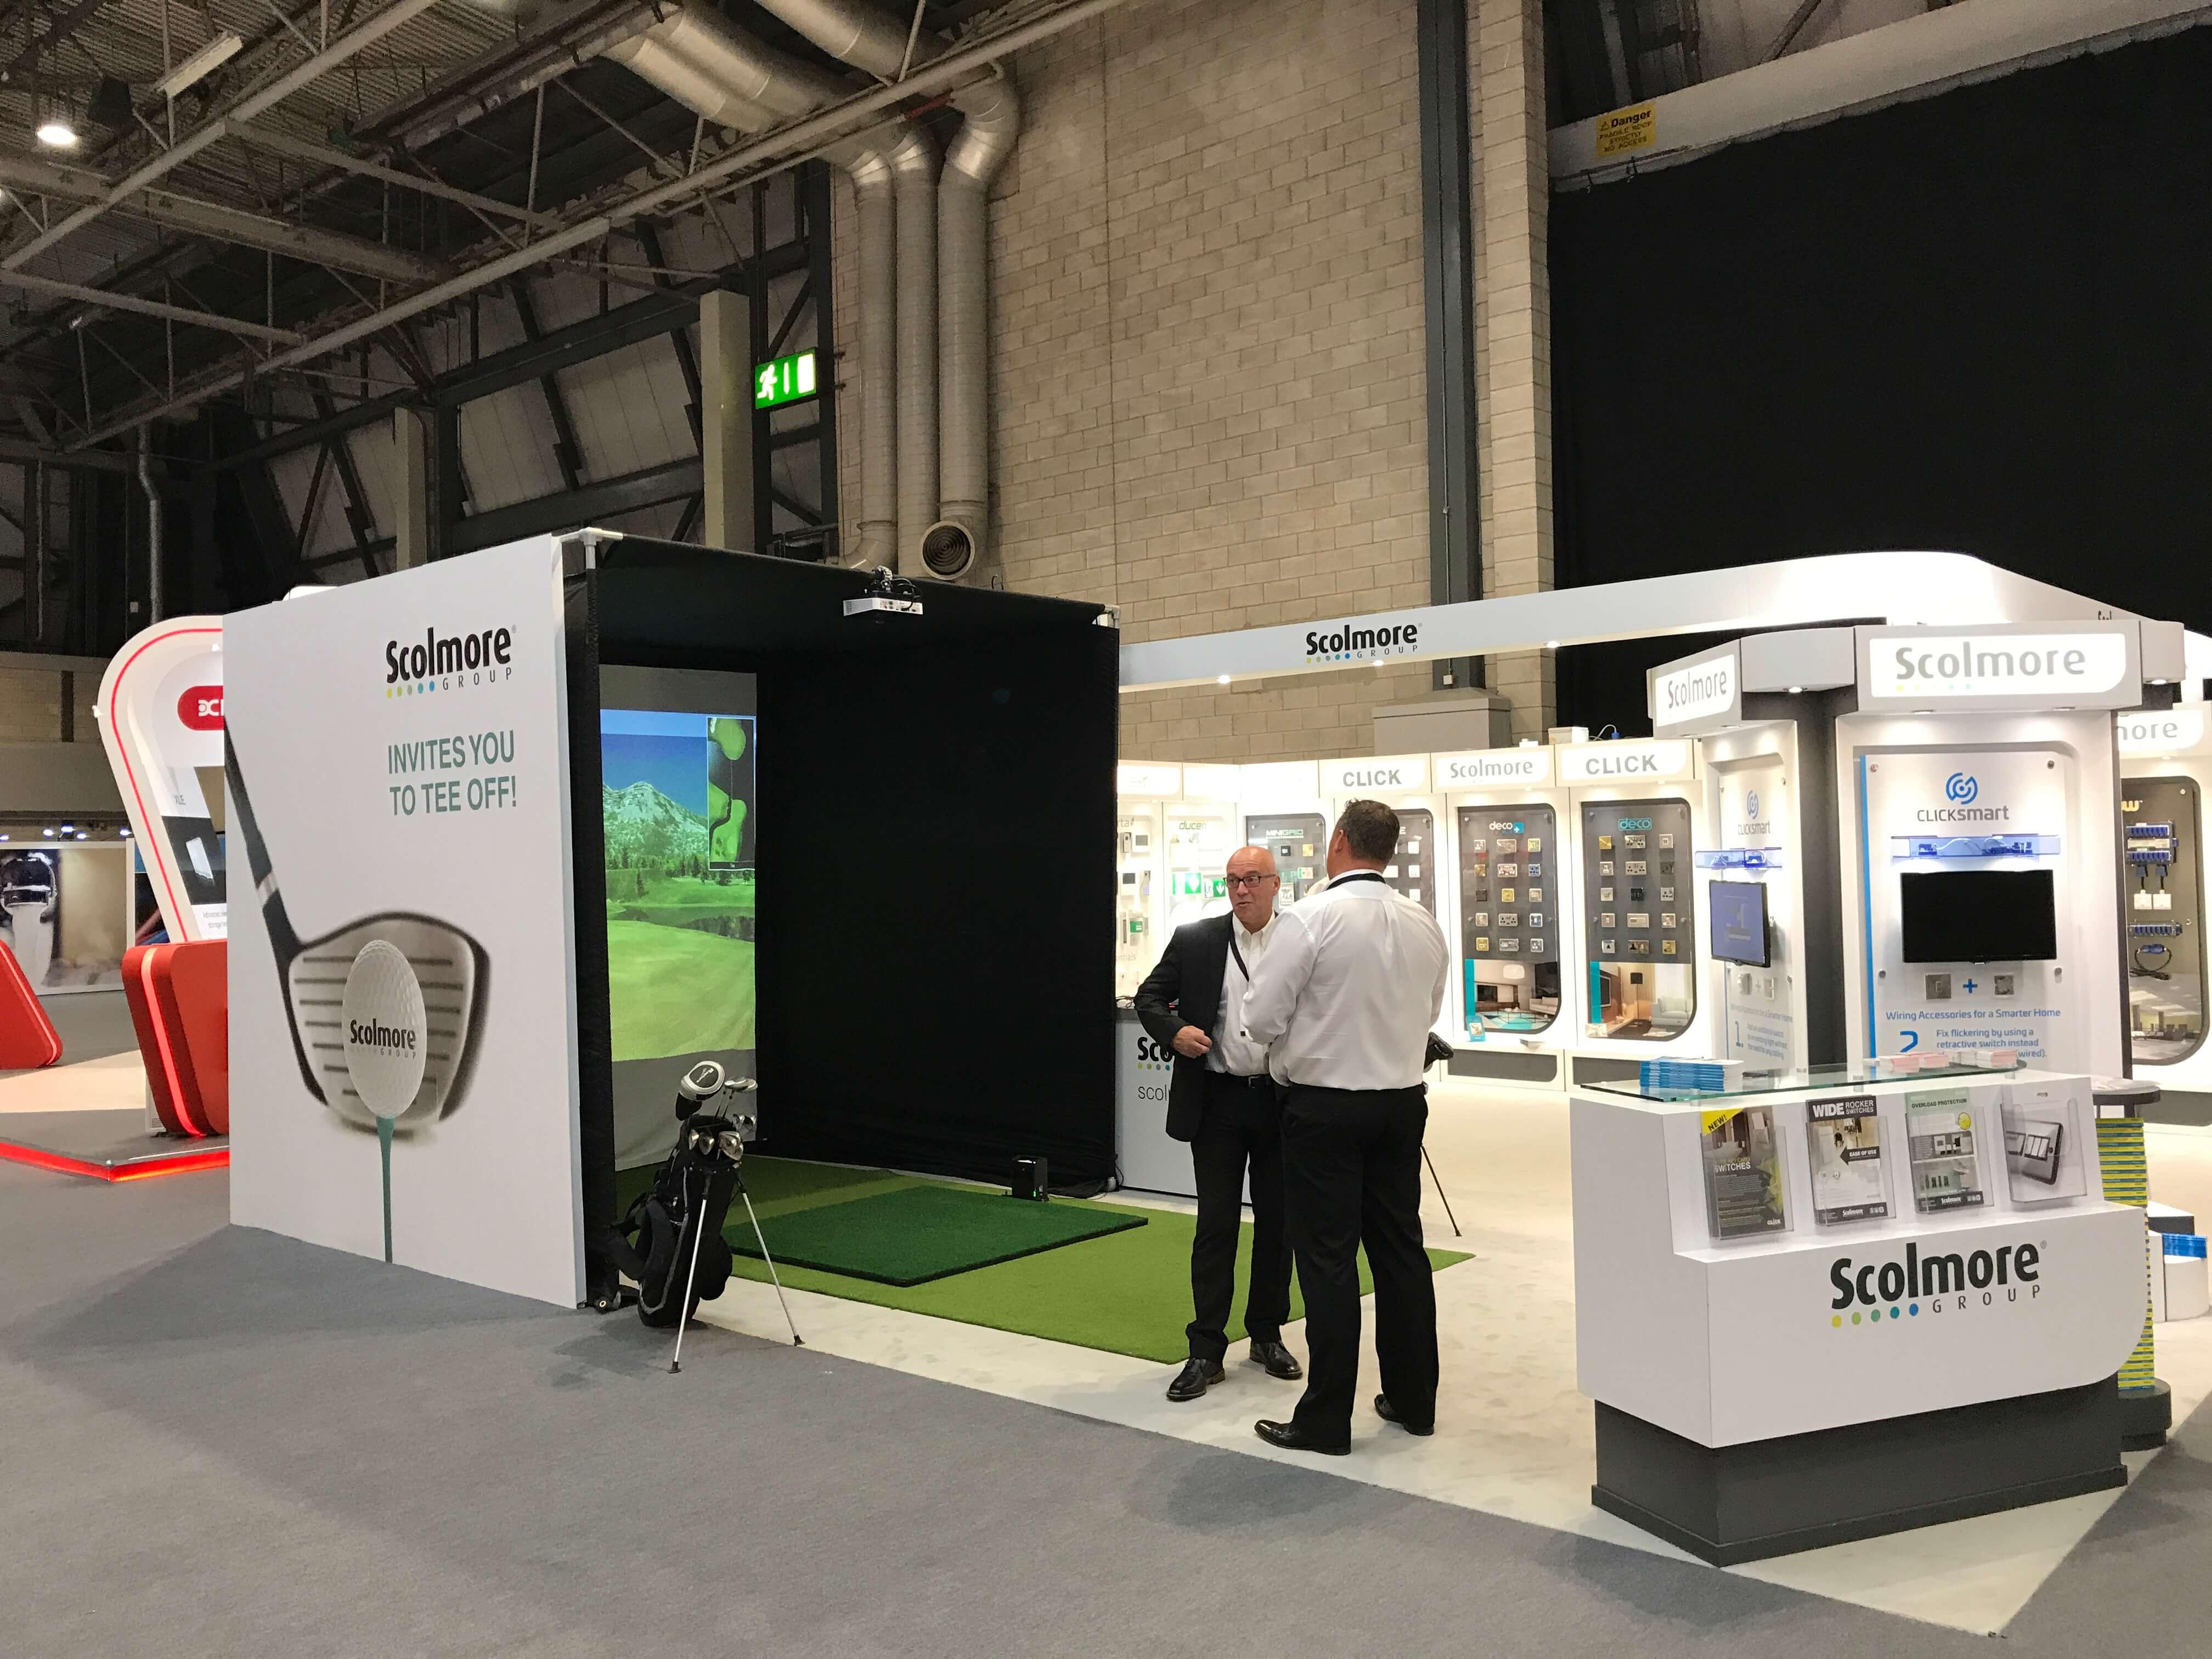 SkyTrak Golf Simulator at The NEC Birmingham